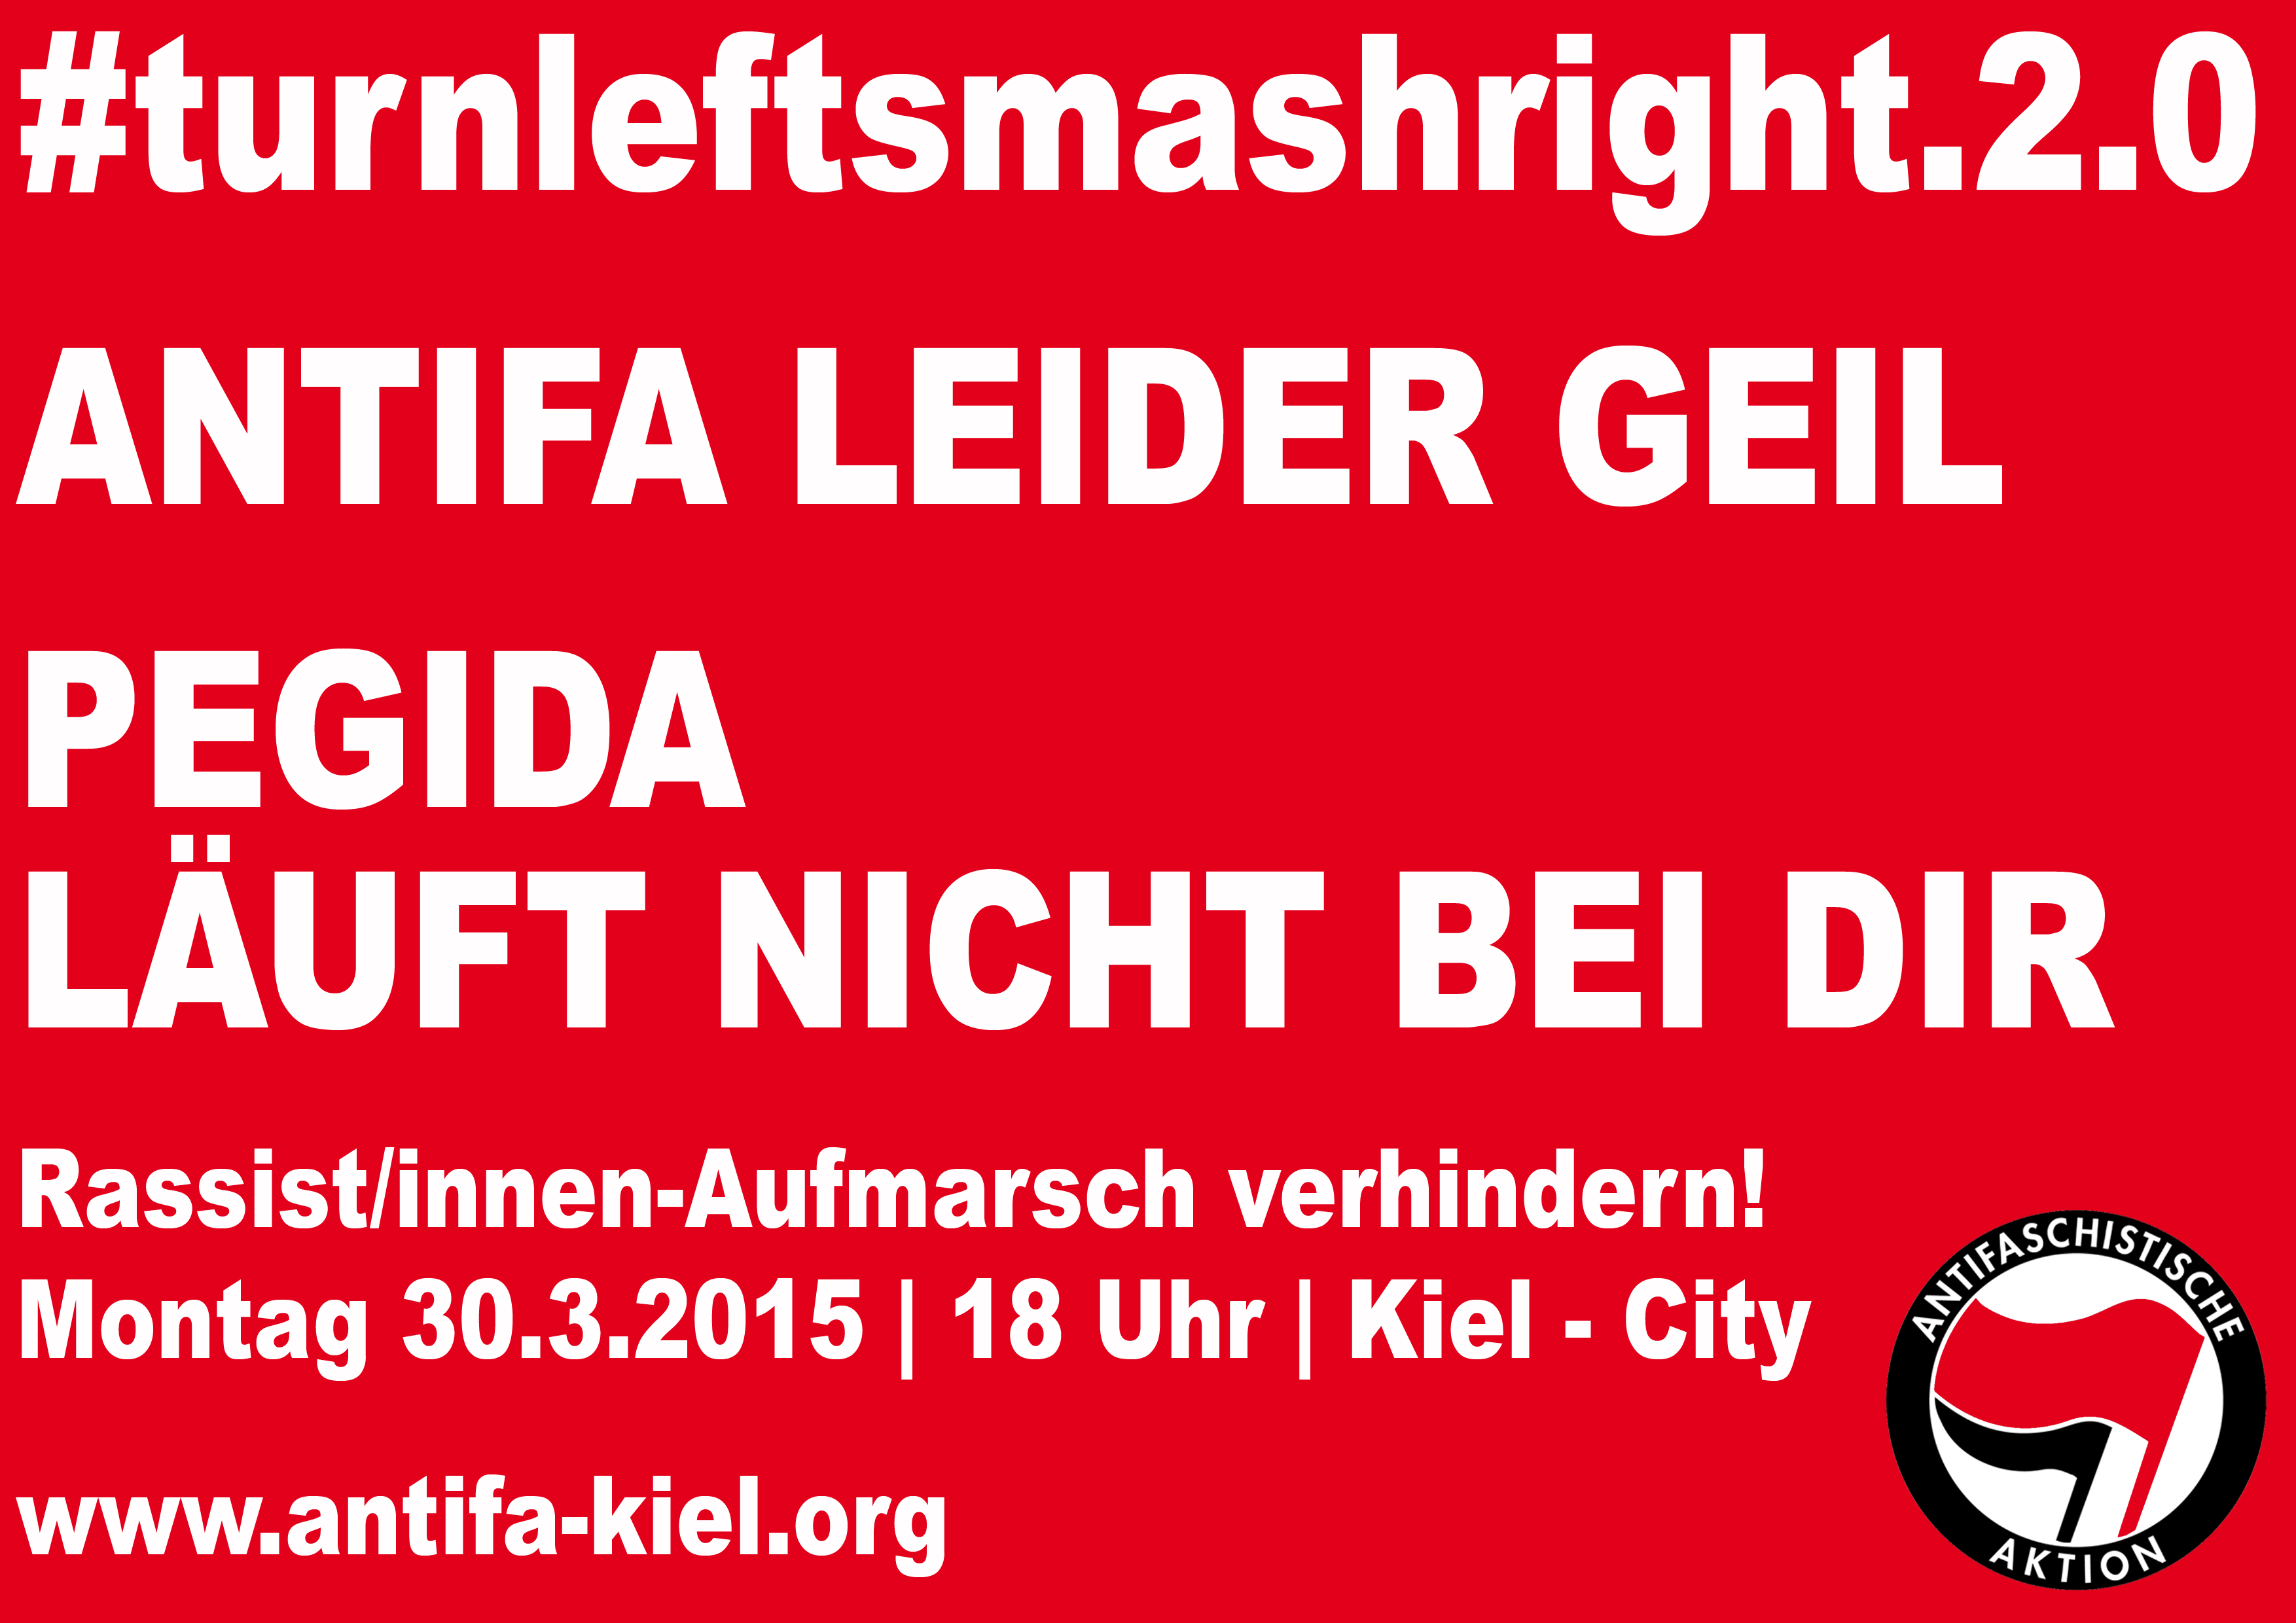 http://www.neu.antifa-kiel.org/wp-content/uploads/import/fuckpegida.jpg